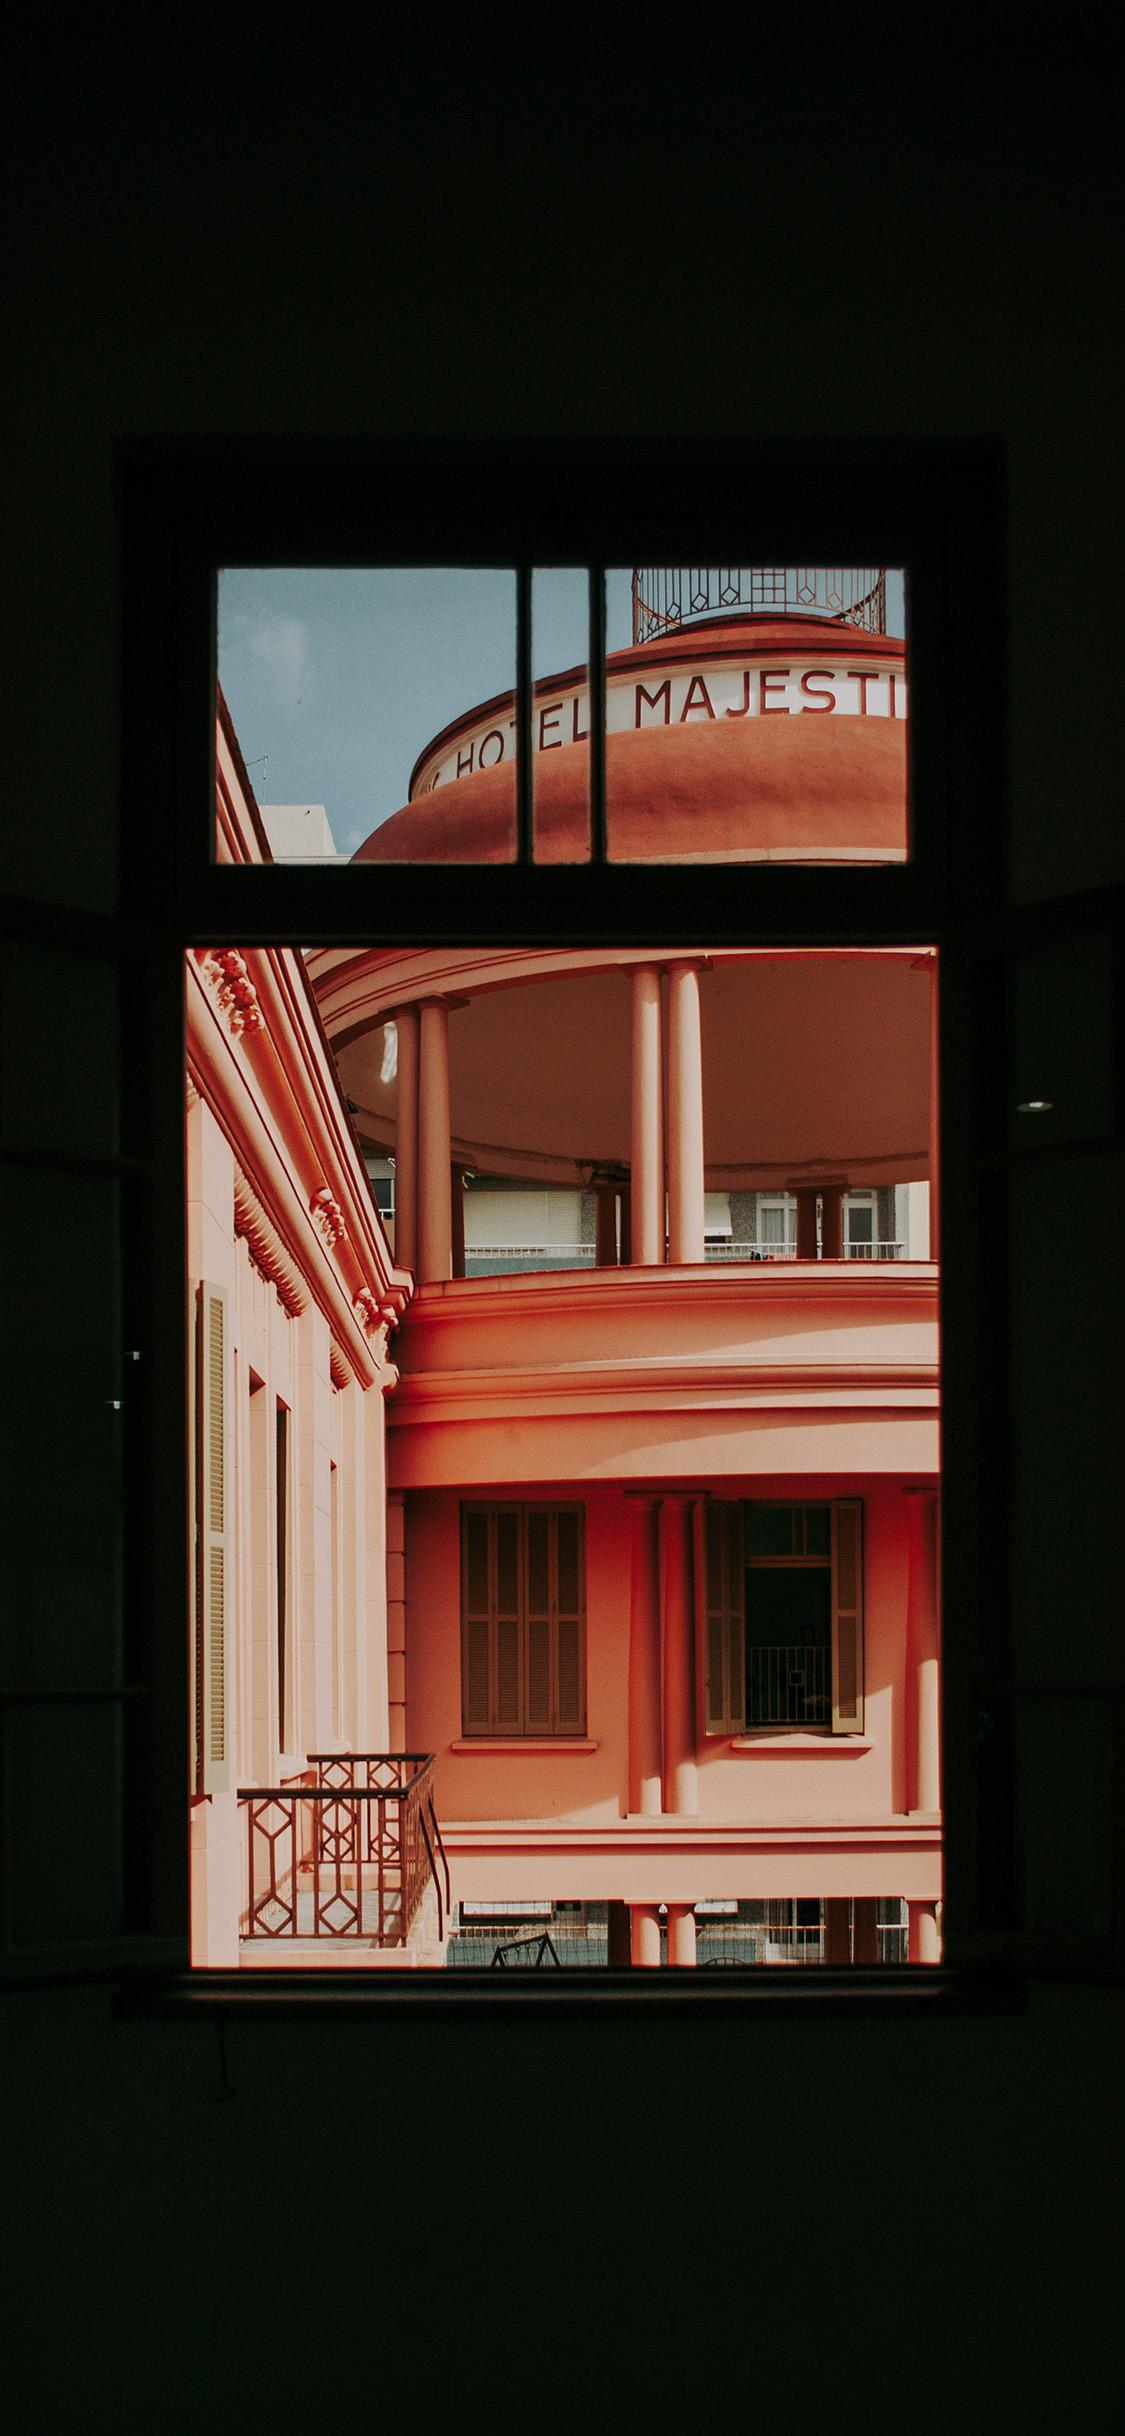 iPhonexpapers.com-Apple-iPhone-wallpaper-ob86-building-window-dark-city-nature